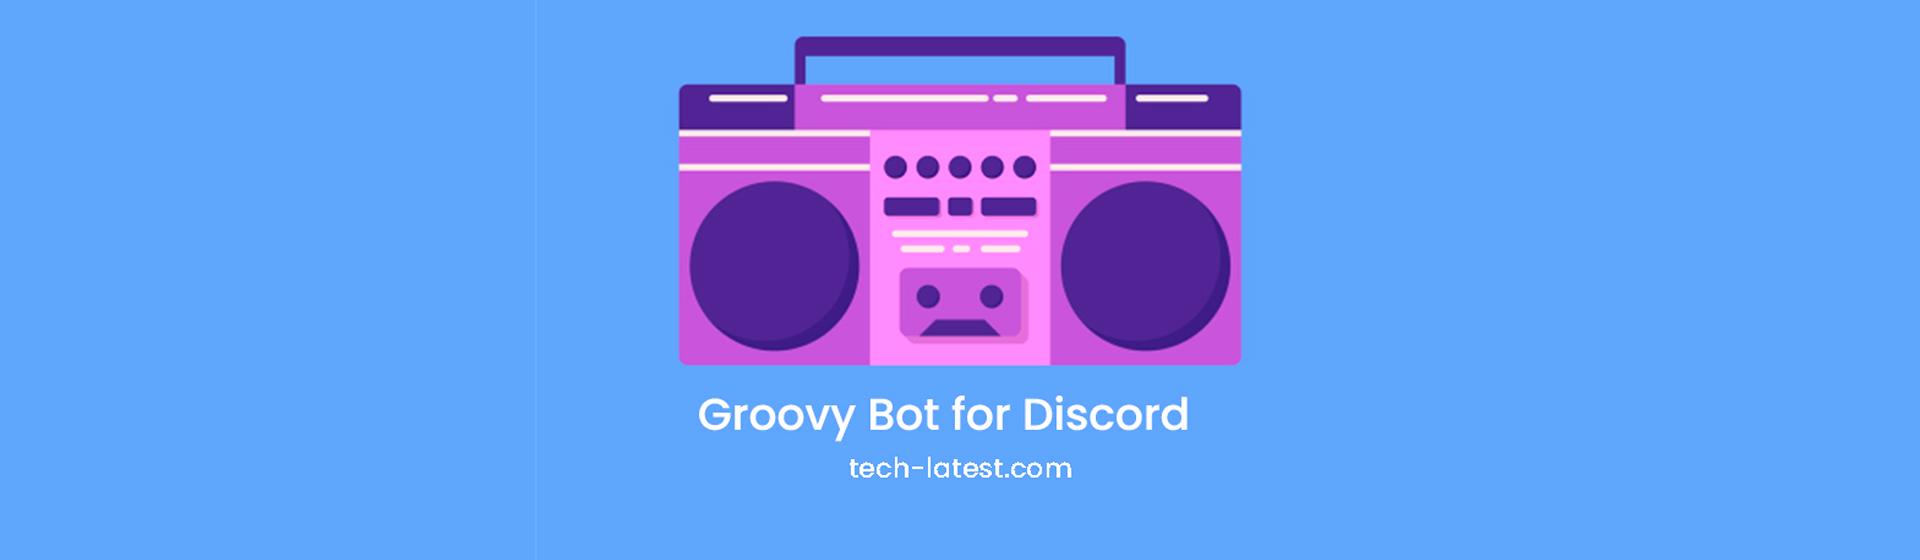 Como usar o Groovy, bot de música do Discord